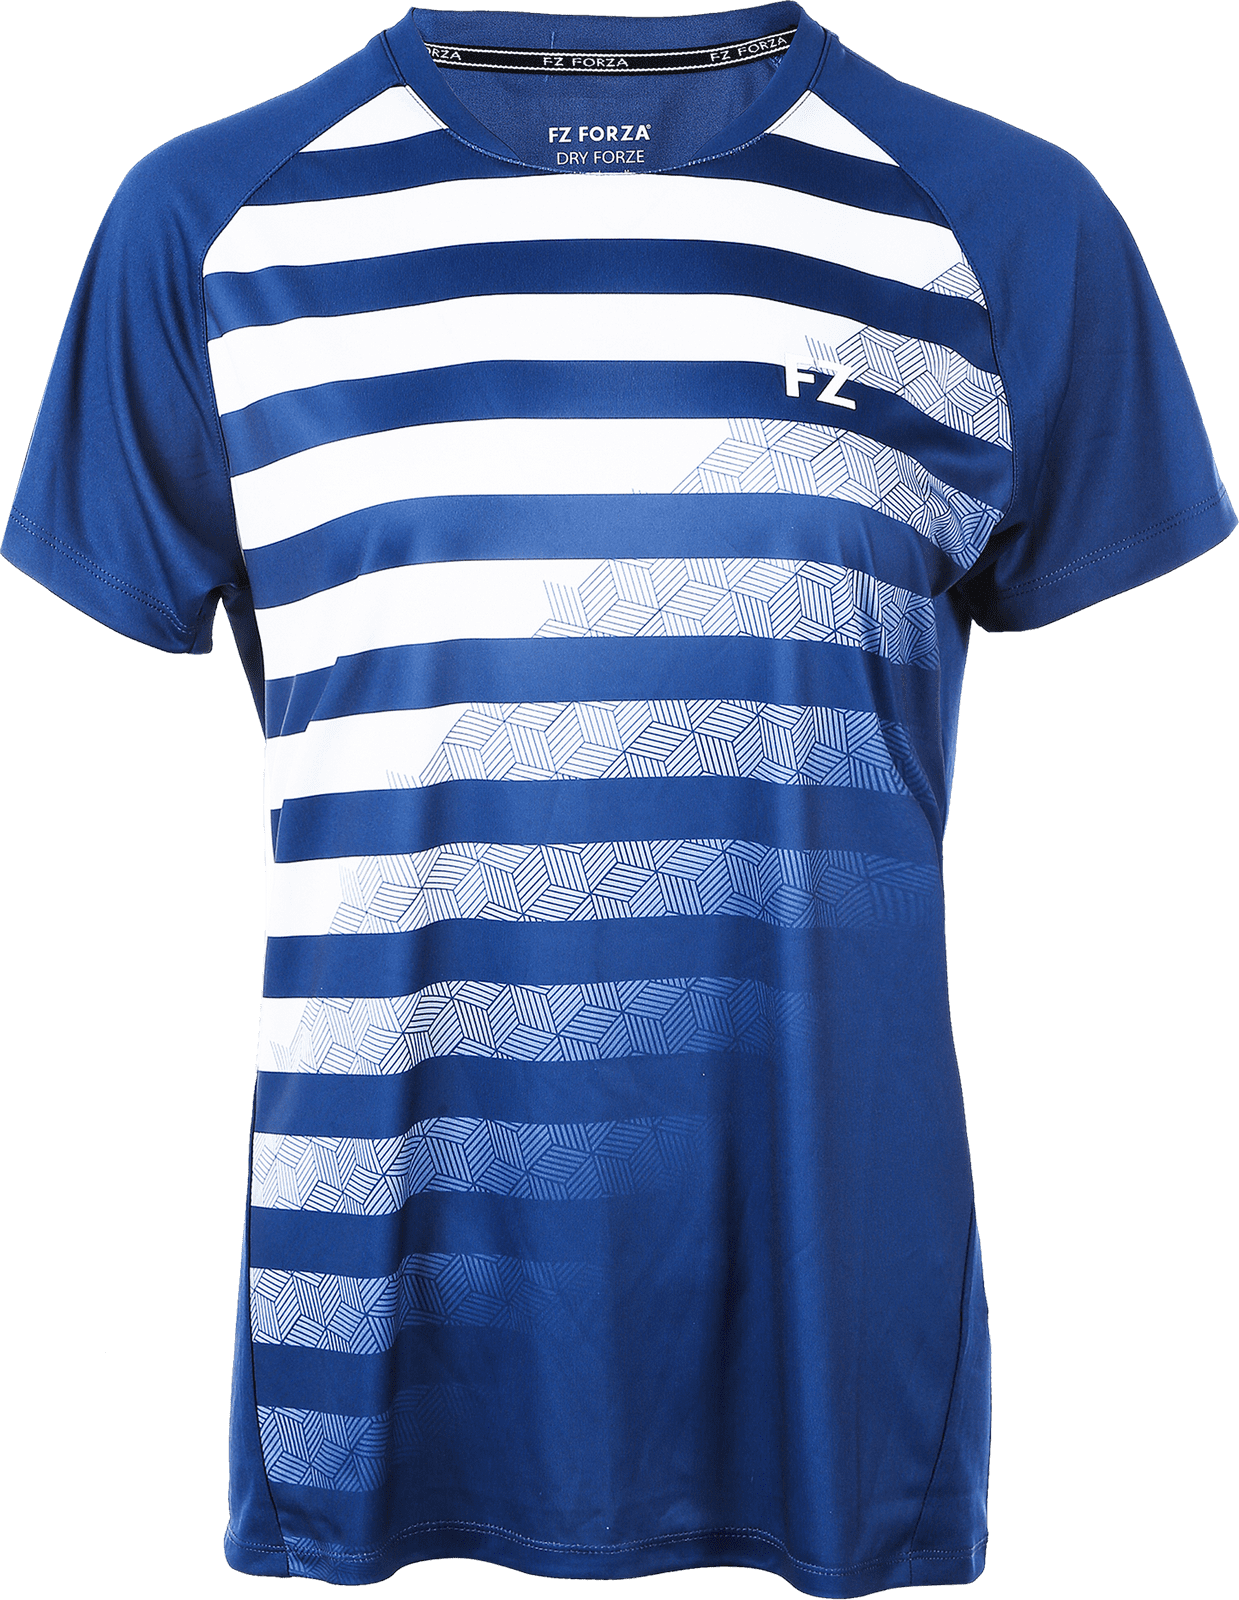 Forza Madison W S/S Tee, 2037 Estate Blue